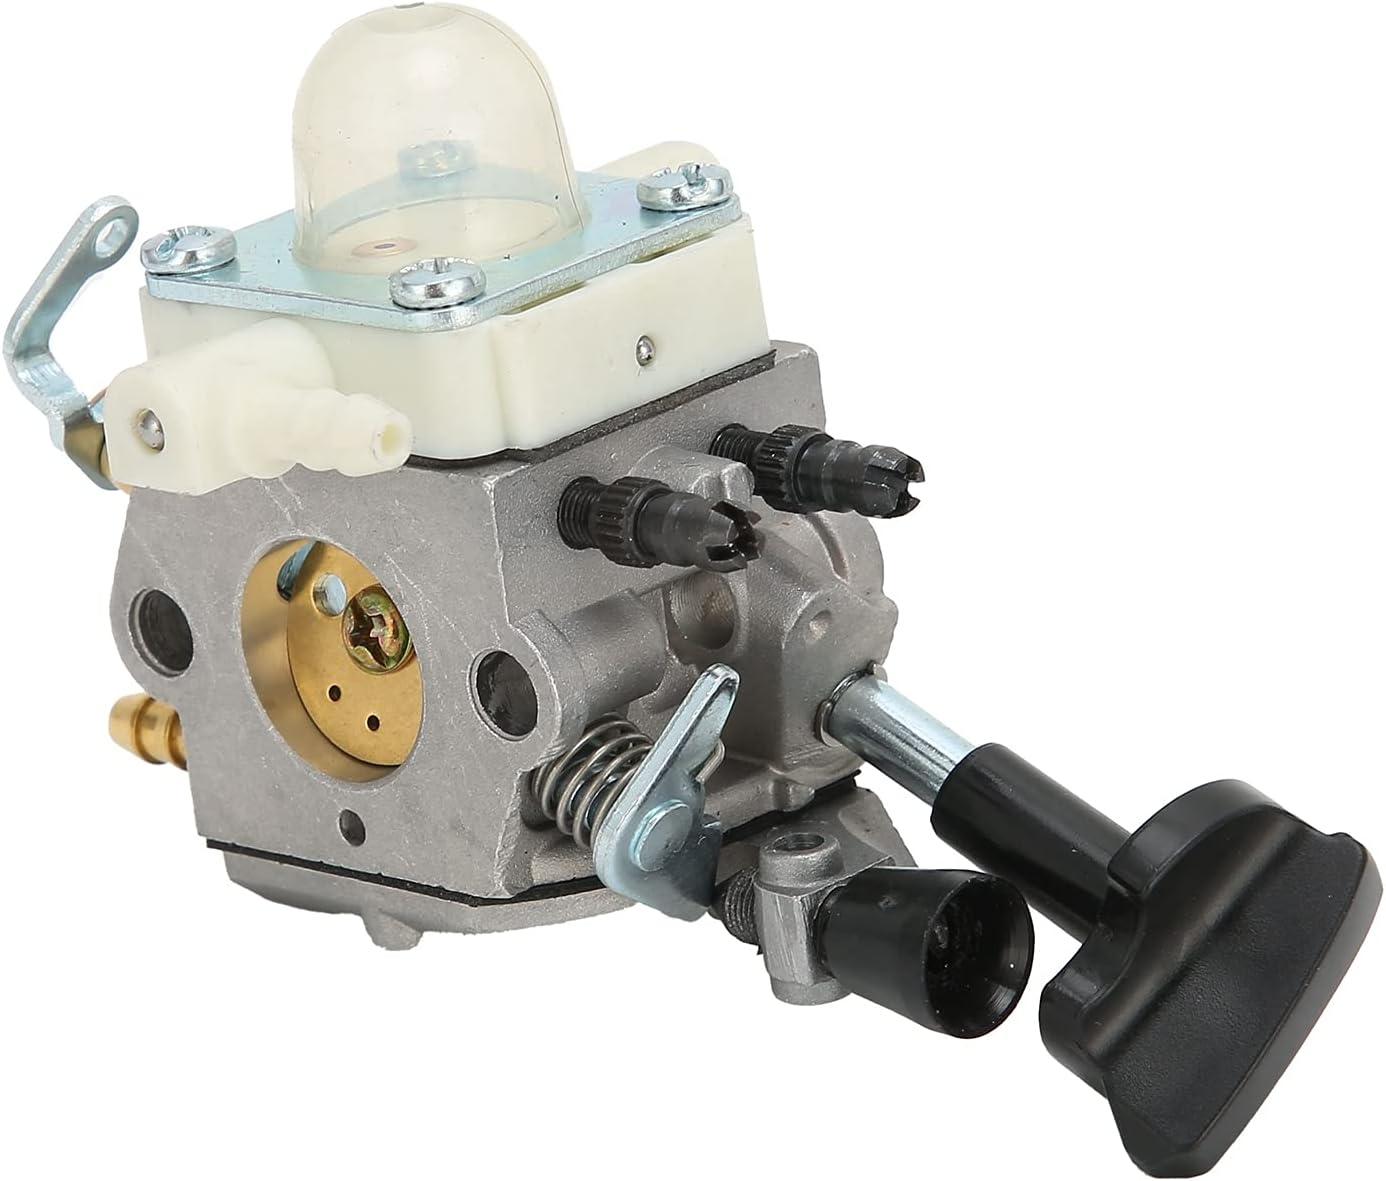 DONN Carburador para STIHL, Larga Vida útil Fabricación Profesional Fácil de Instalar y reemplazar Carburador para soplador STIHL BG56 BG56C SH 56 SH56C SH86 SH86C